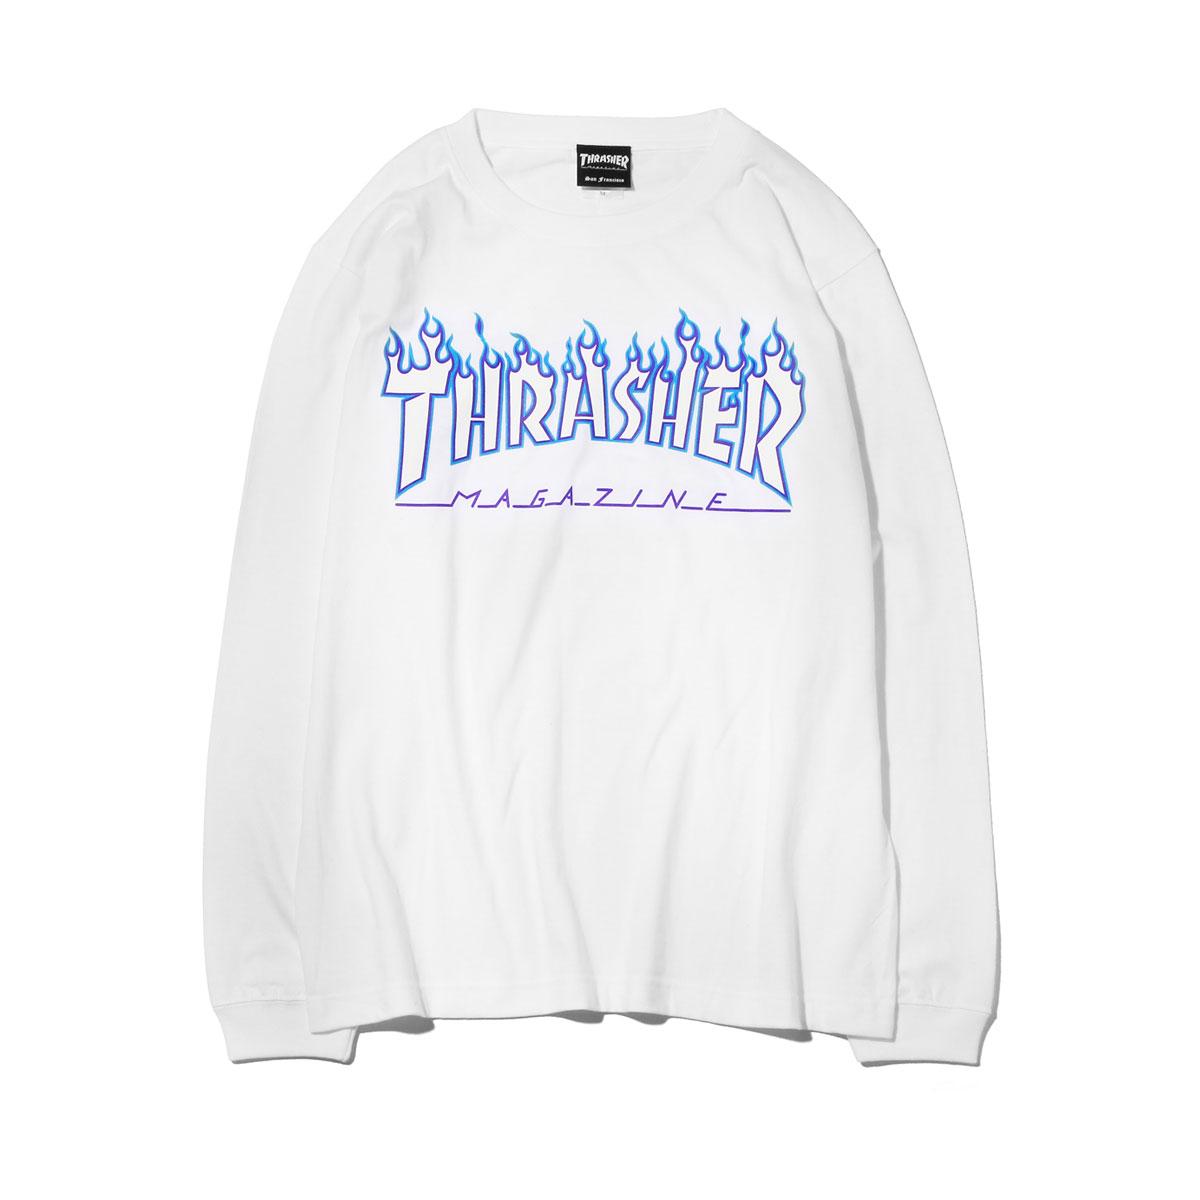 6ec8ada6 Thrasher Flame T Shirt South Africa